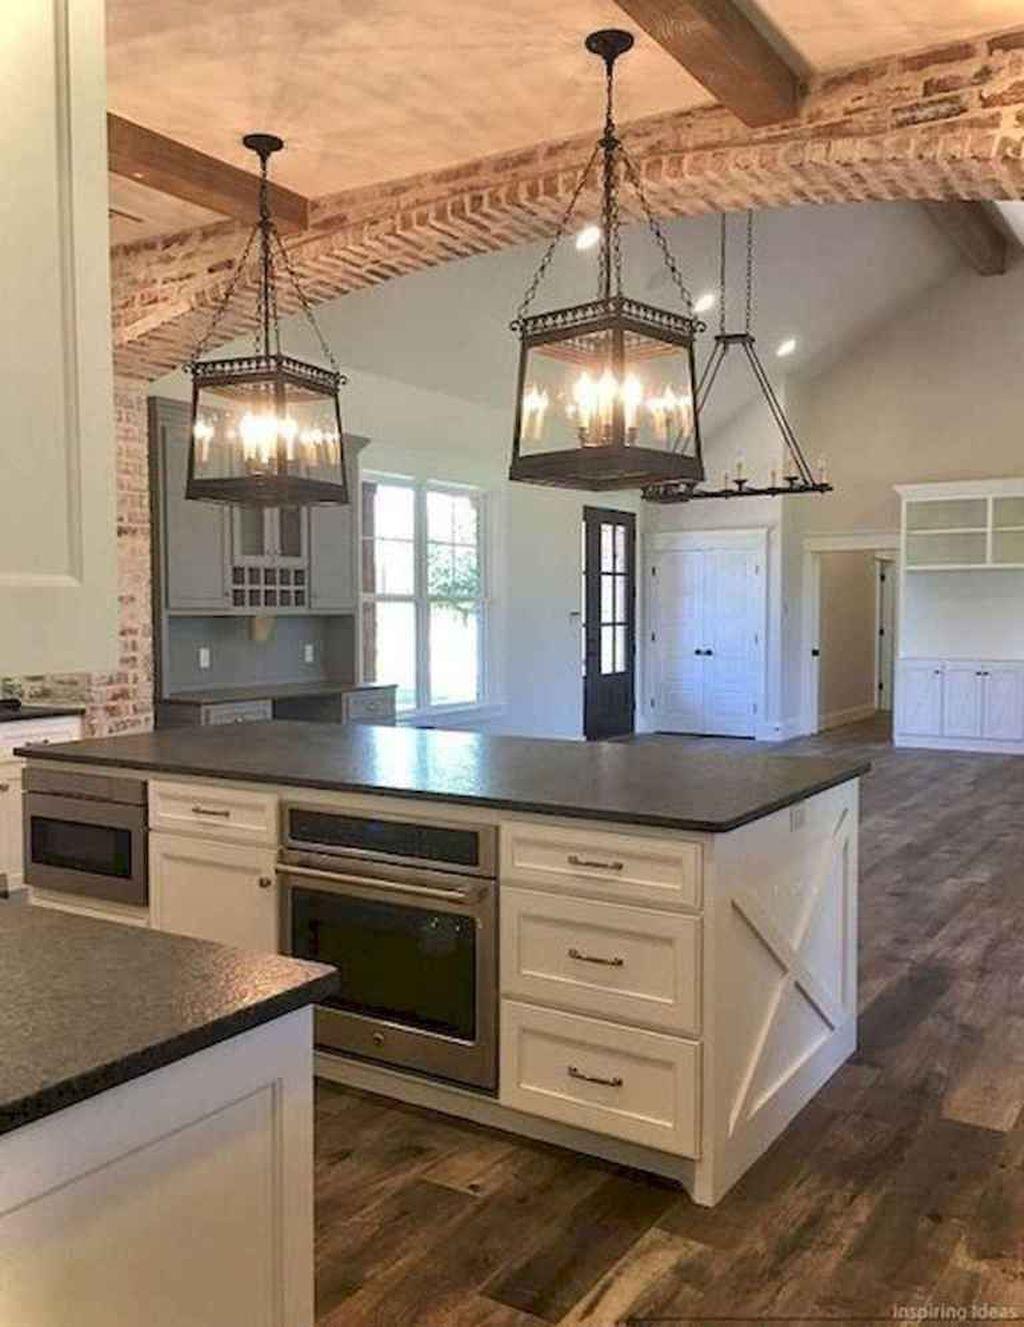 47 DIY Farmhouse Kitchen Makeover Ideas in 2020